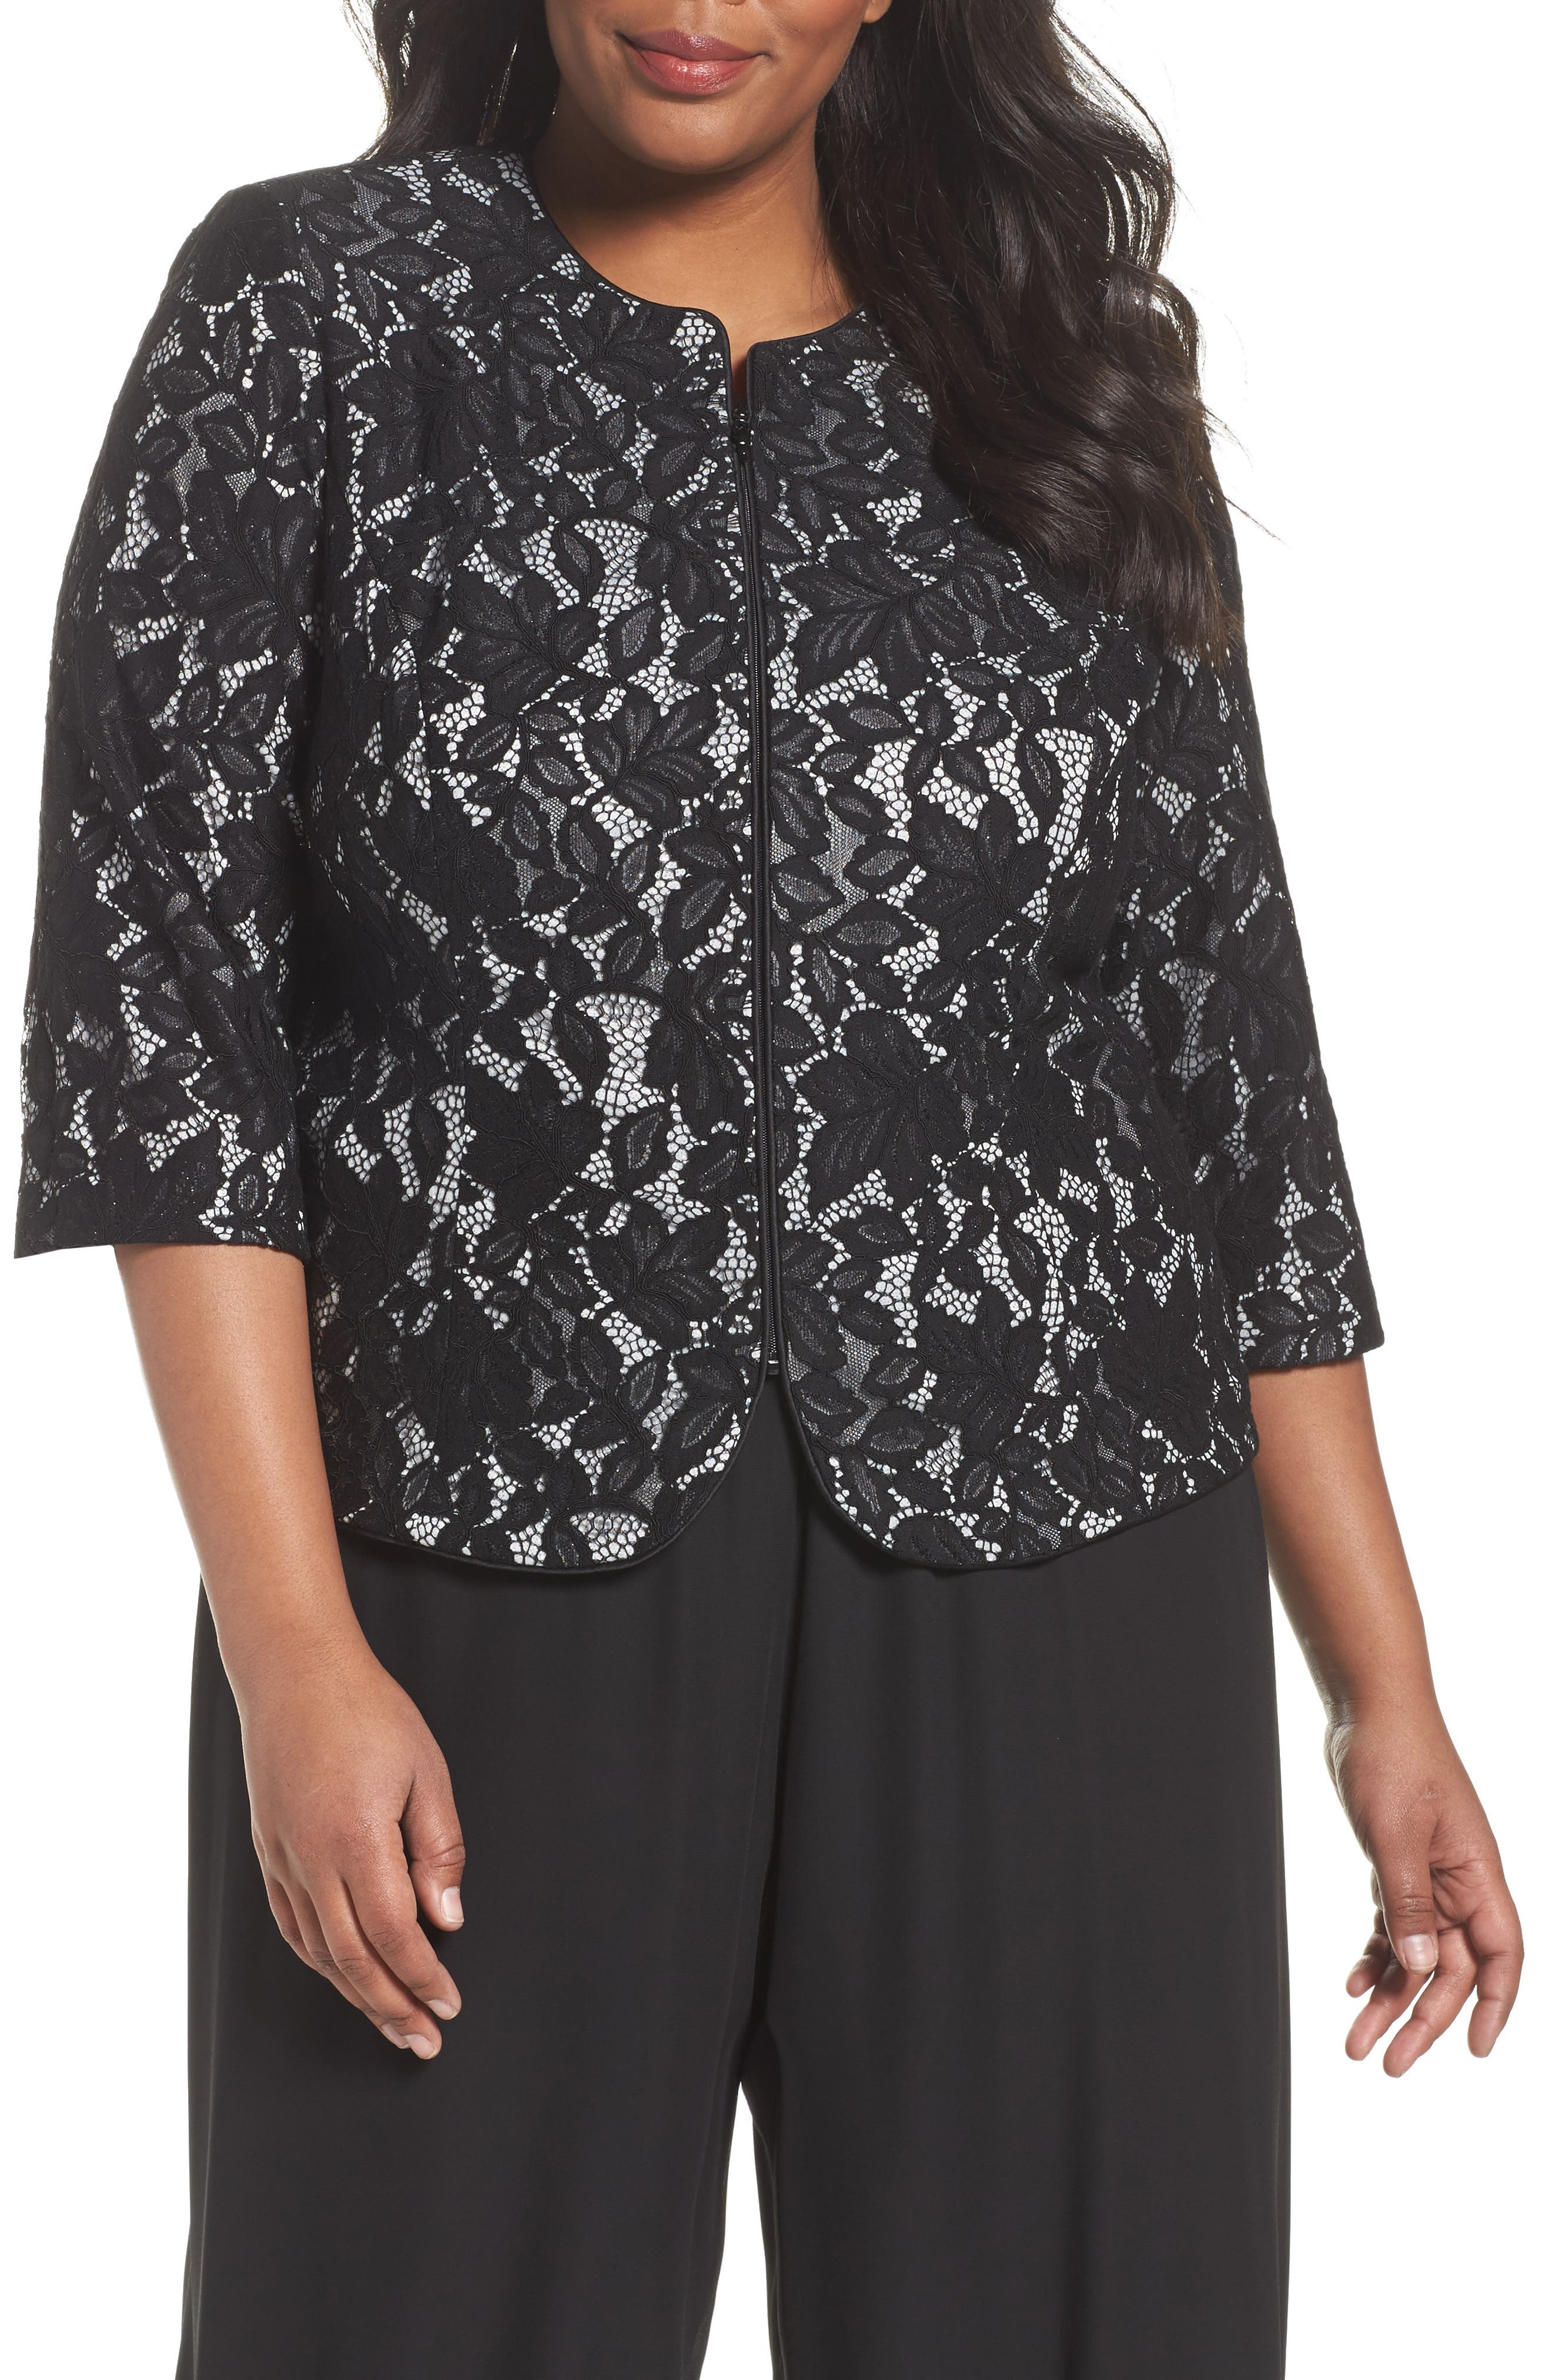 Lace Jacket,                             Main thumbnail 1, color,                             Black/ Silver